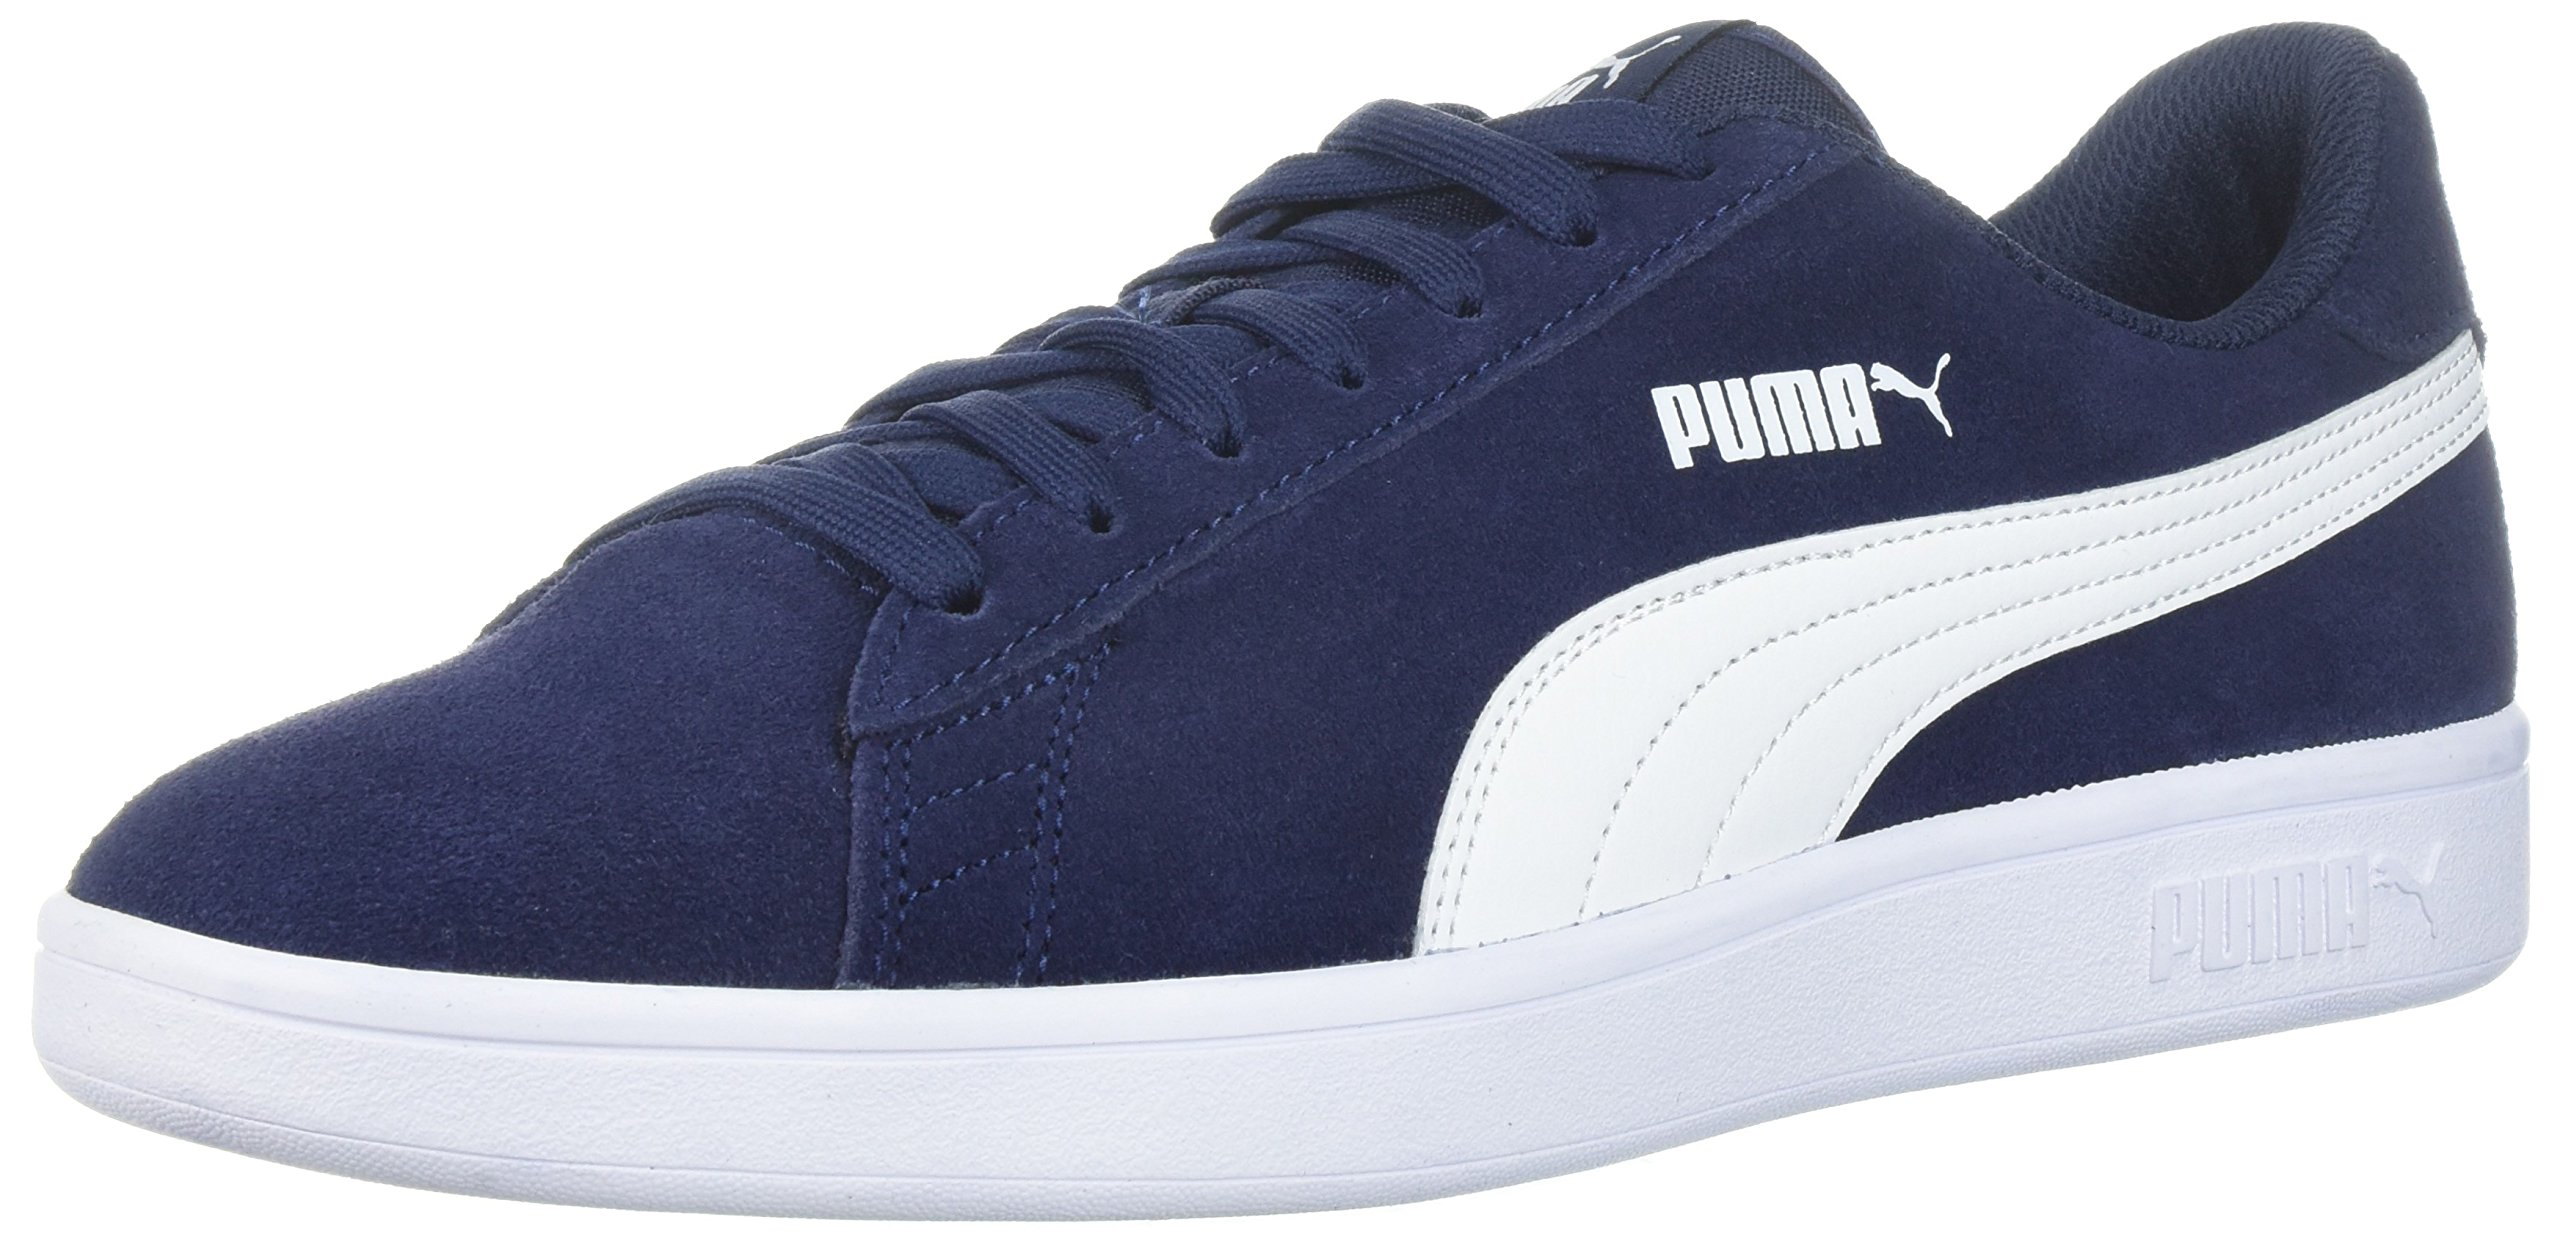 PUMA Men's Smash v2 Sneaker, Peacoat White, 8.5 M US